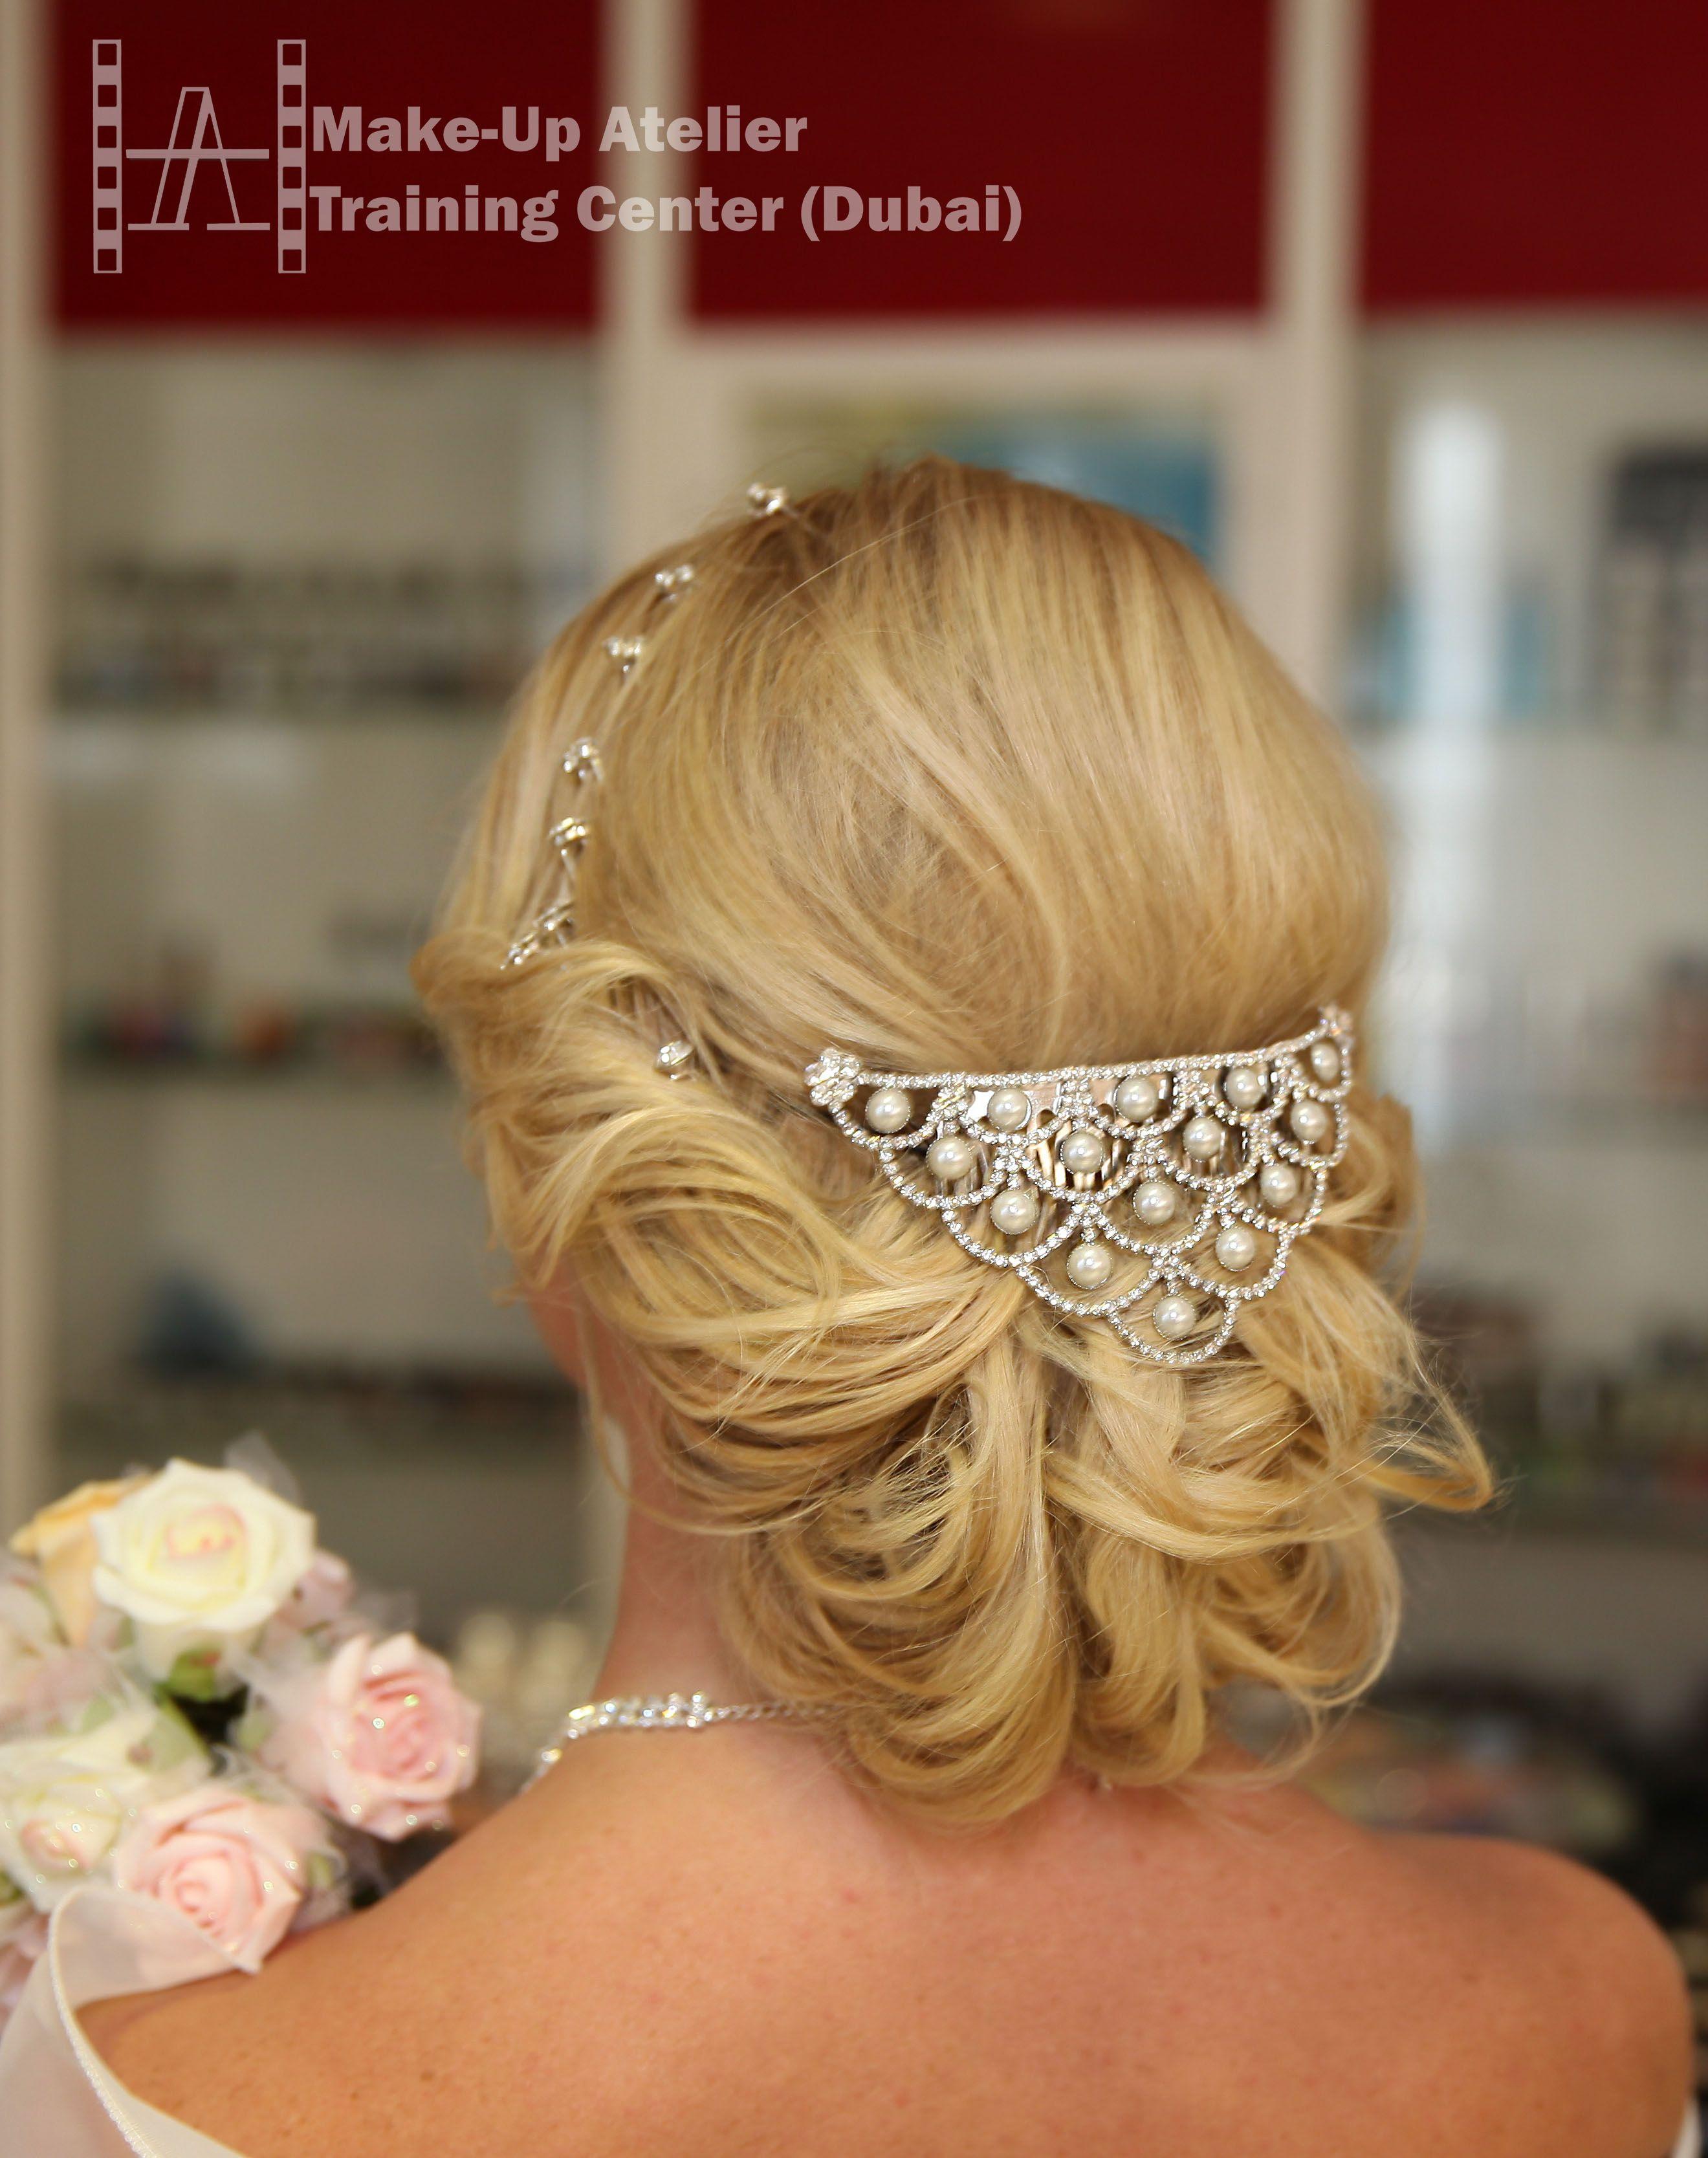 make-up atelier training center, dubai / bridal hairstyle